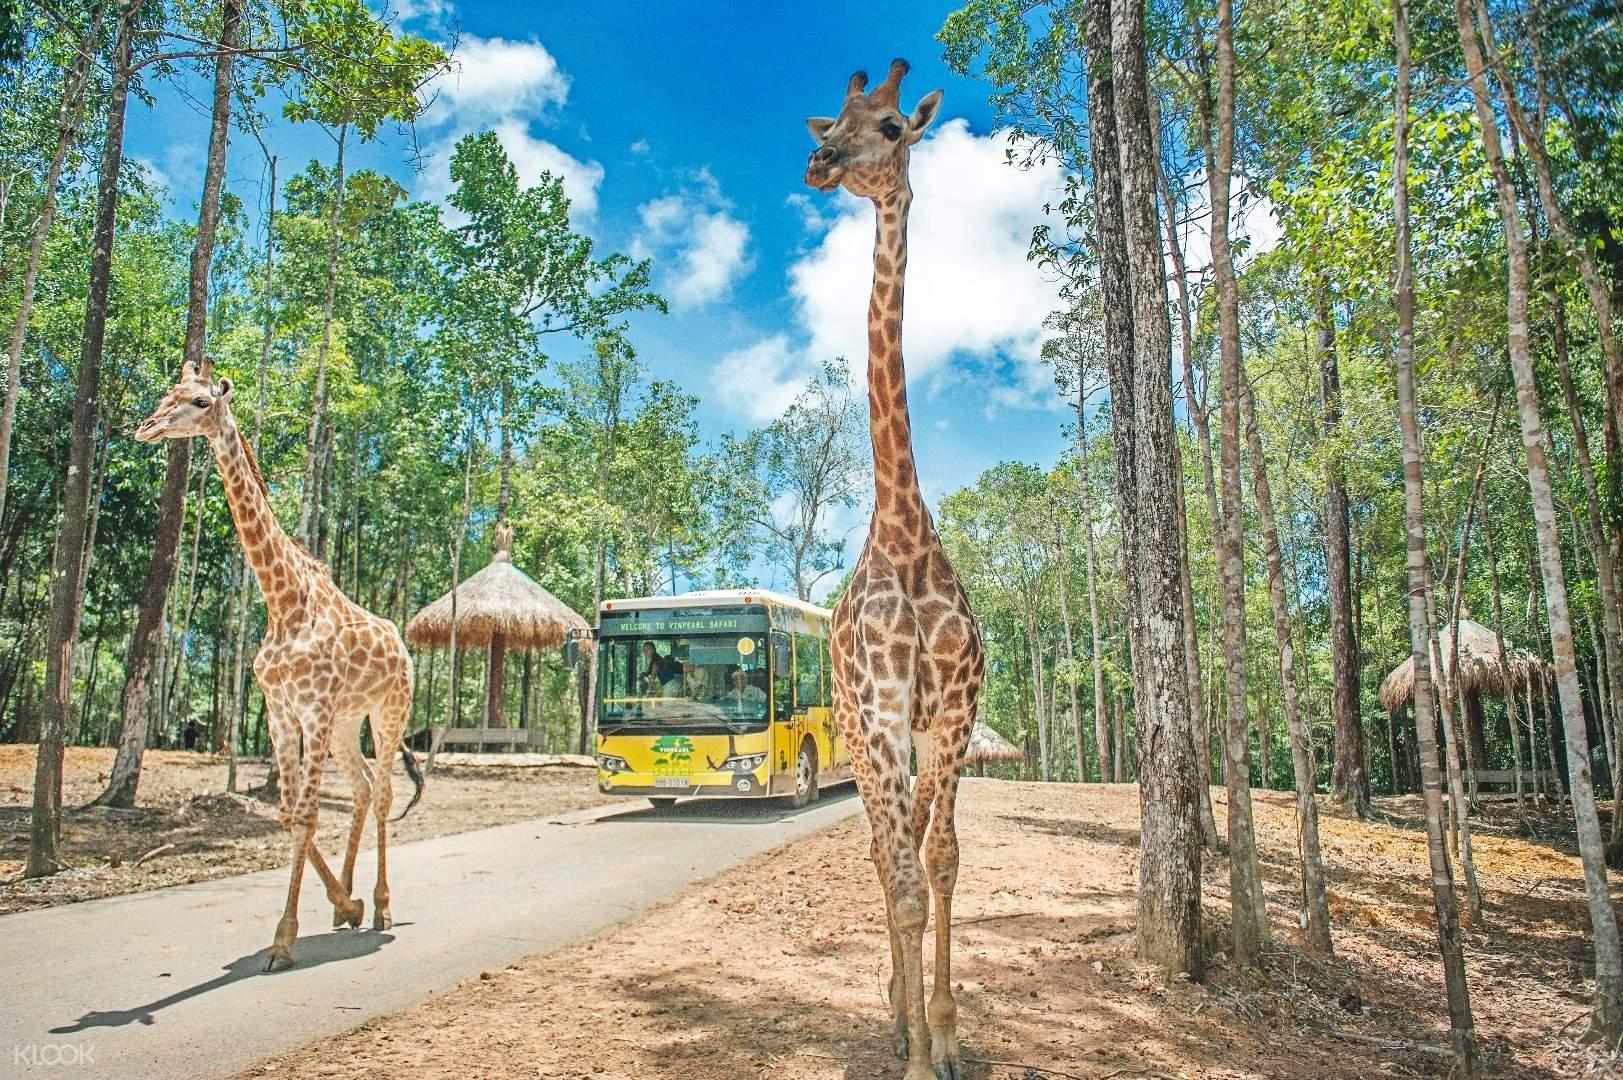 GIẢM 30%] Vé Vinpearl Safari Phú Quốc